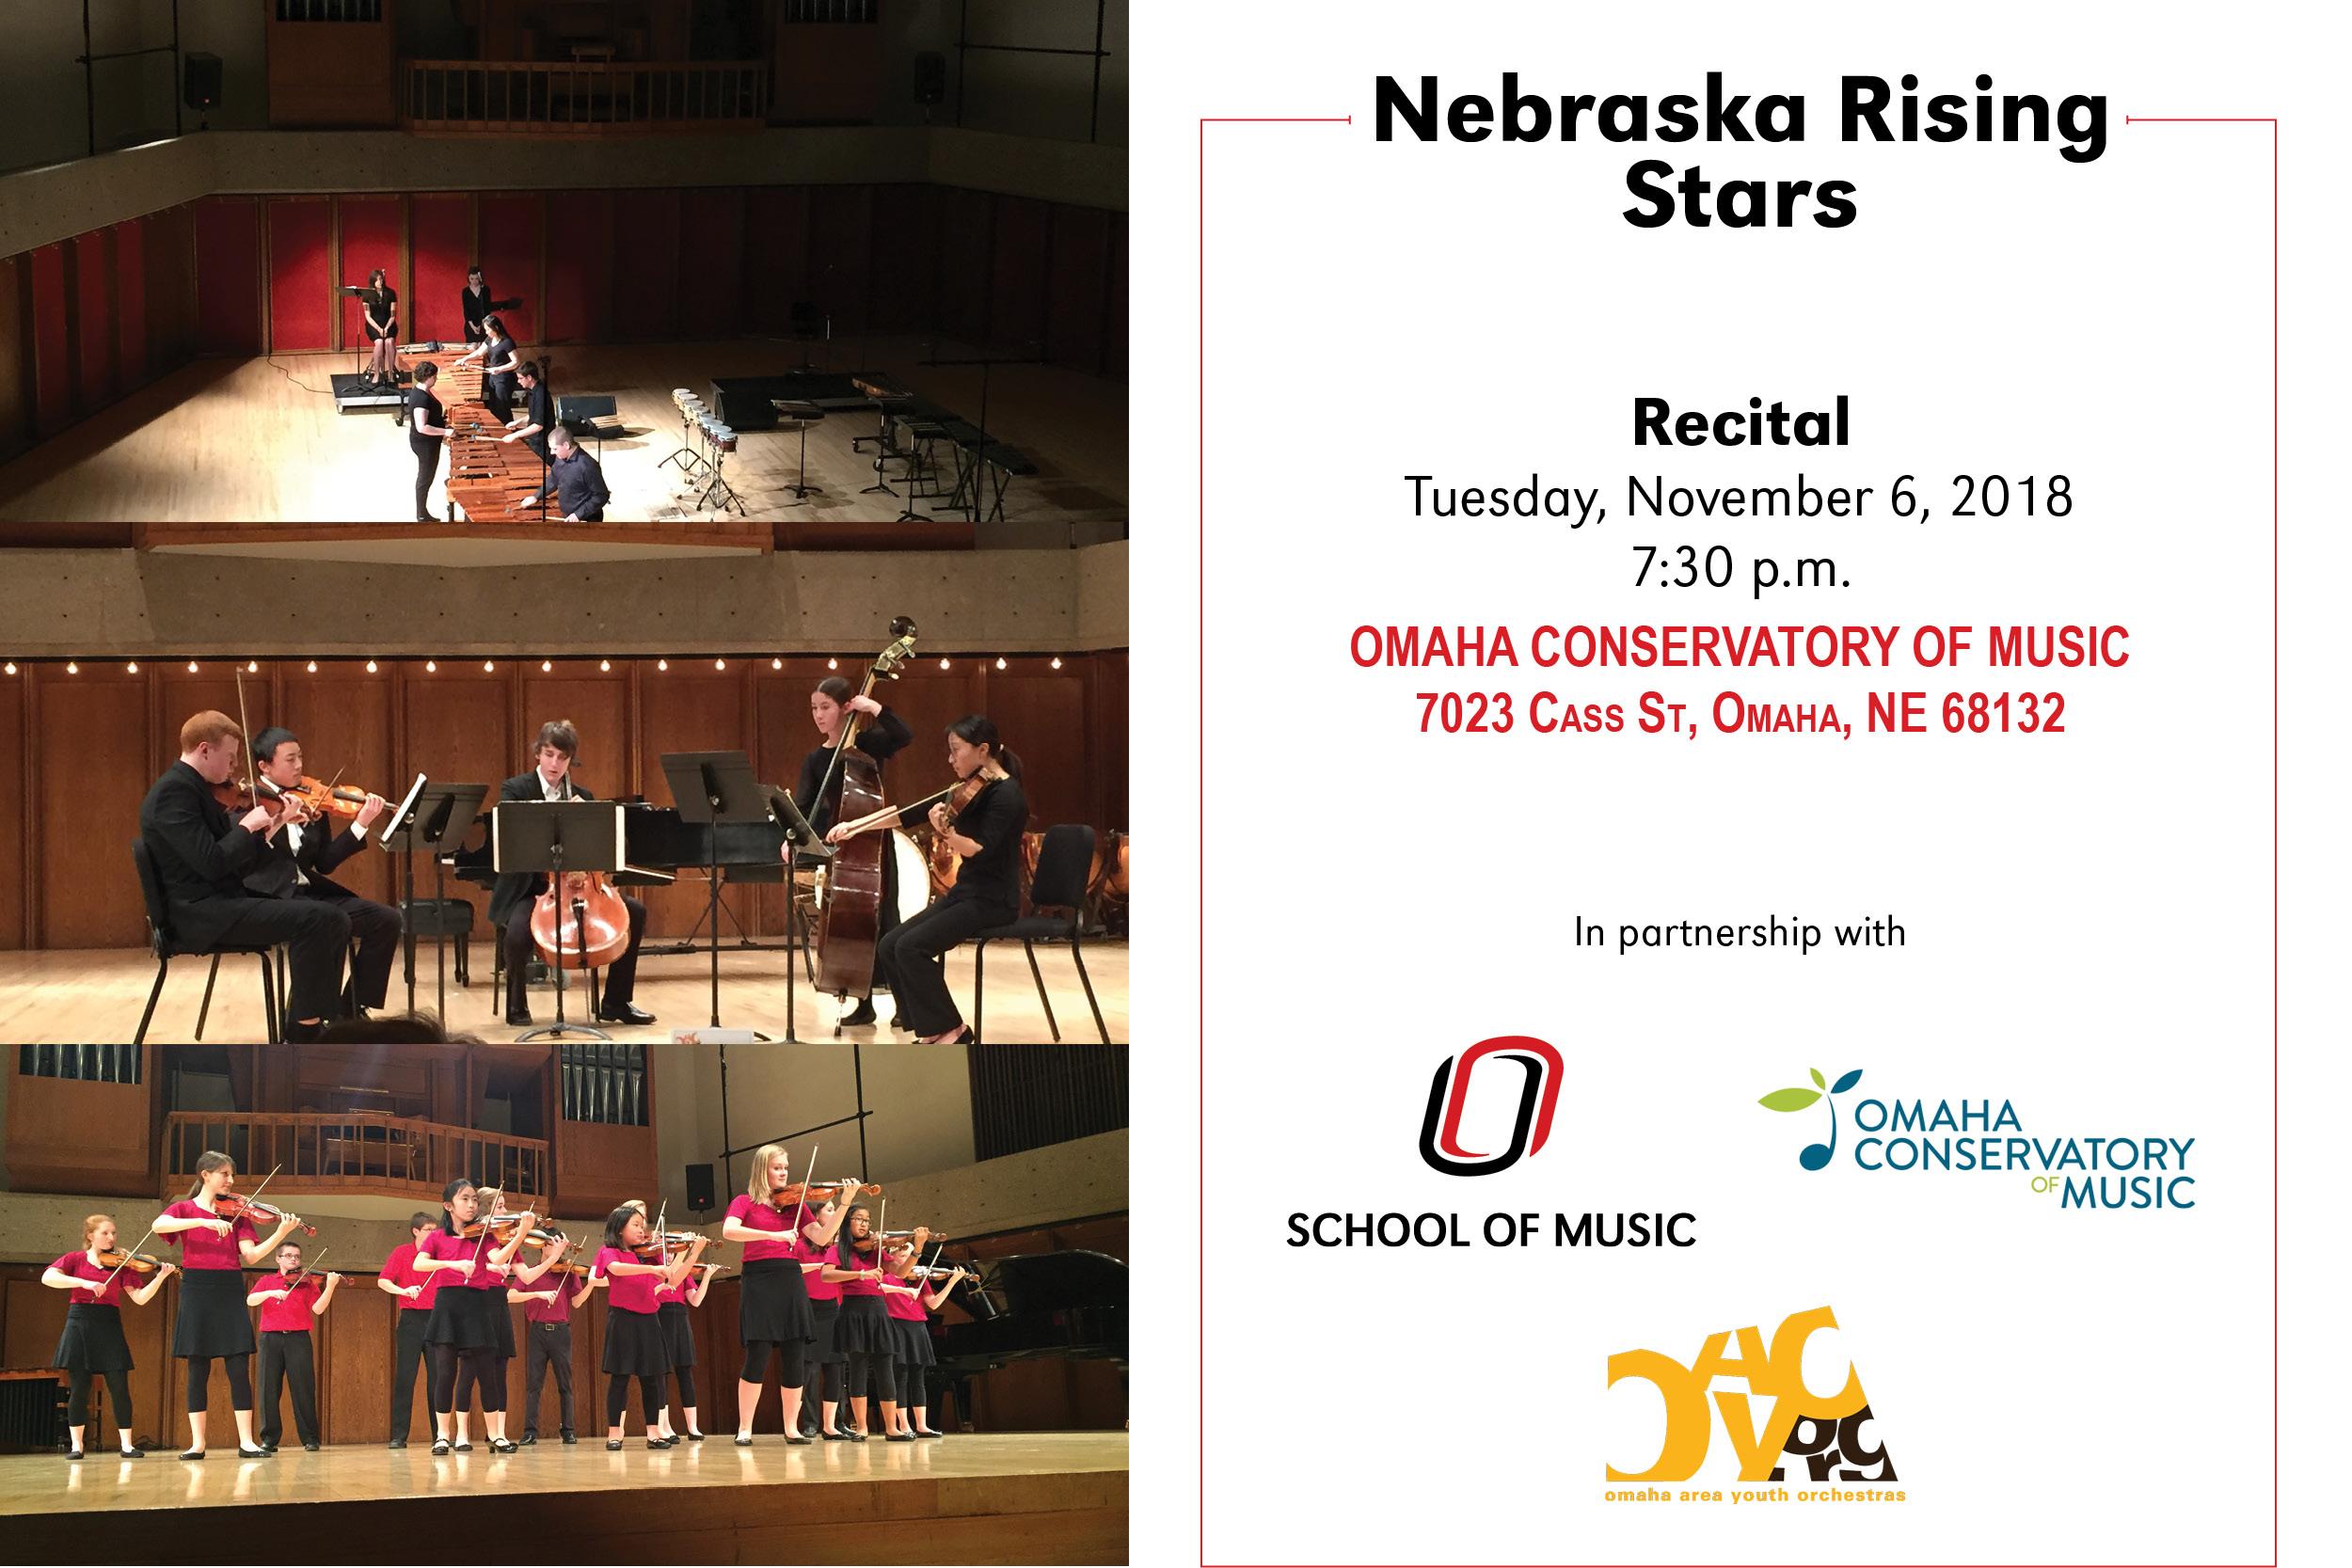 Nebraska Rising Stars School Of Music University Of Nebraska Omaha